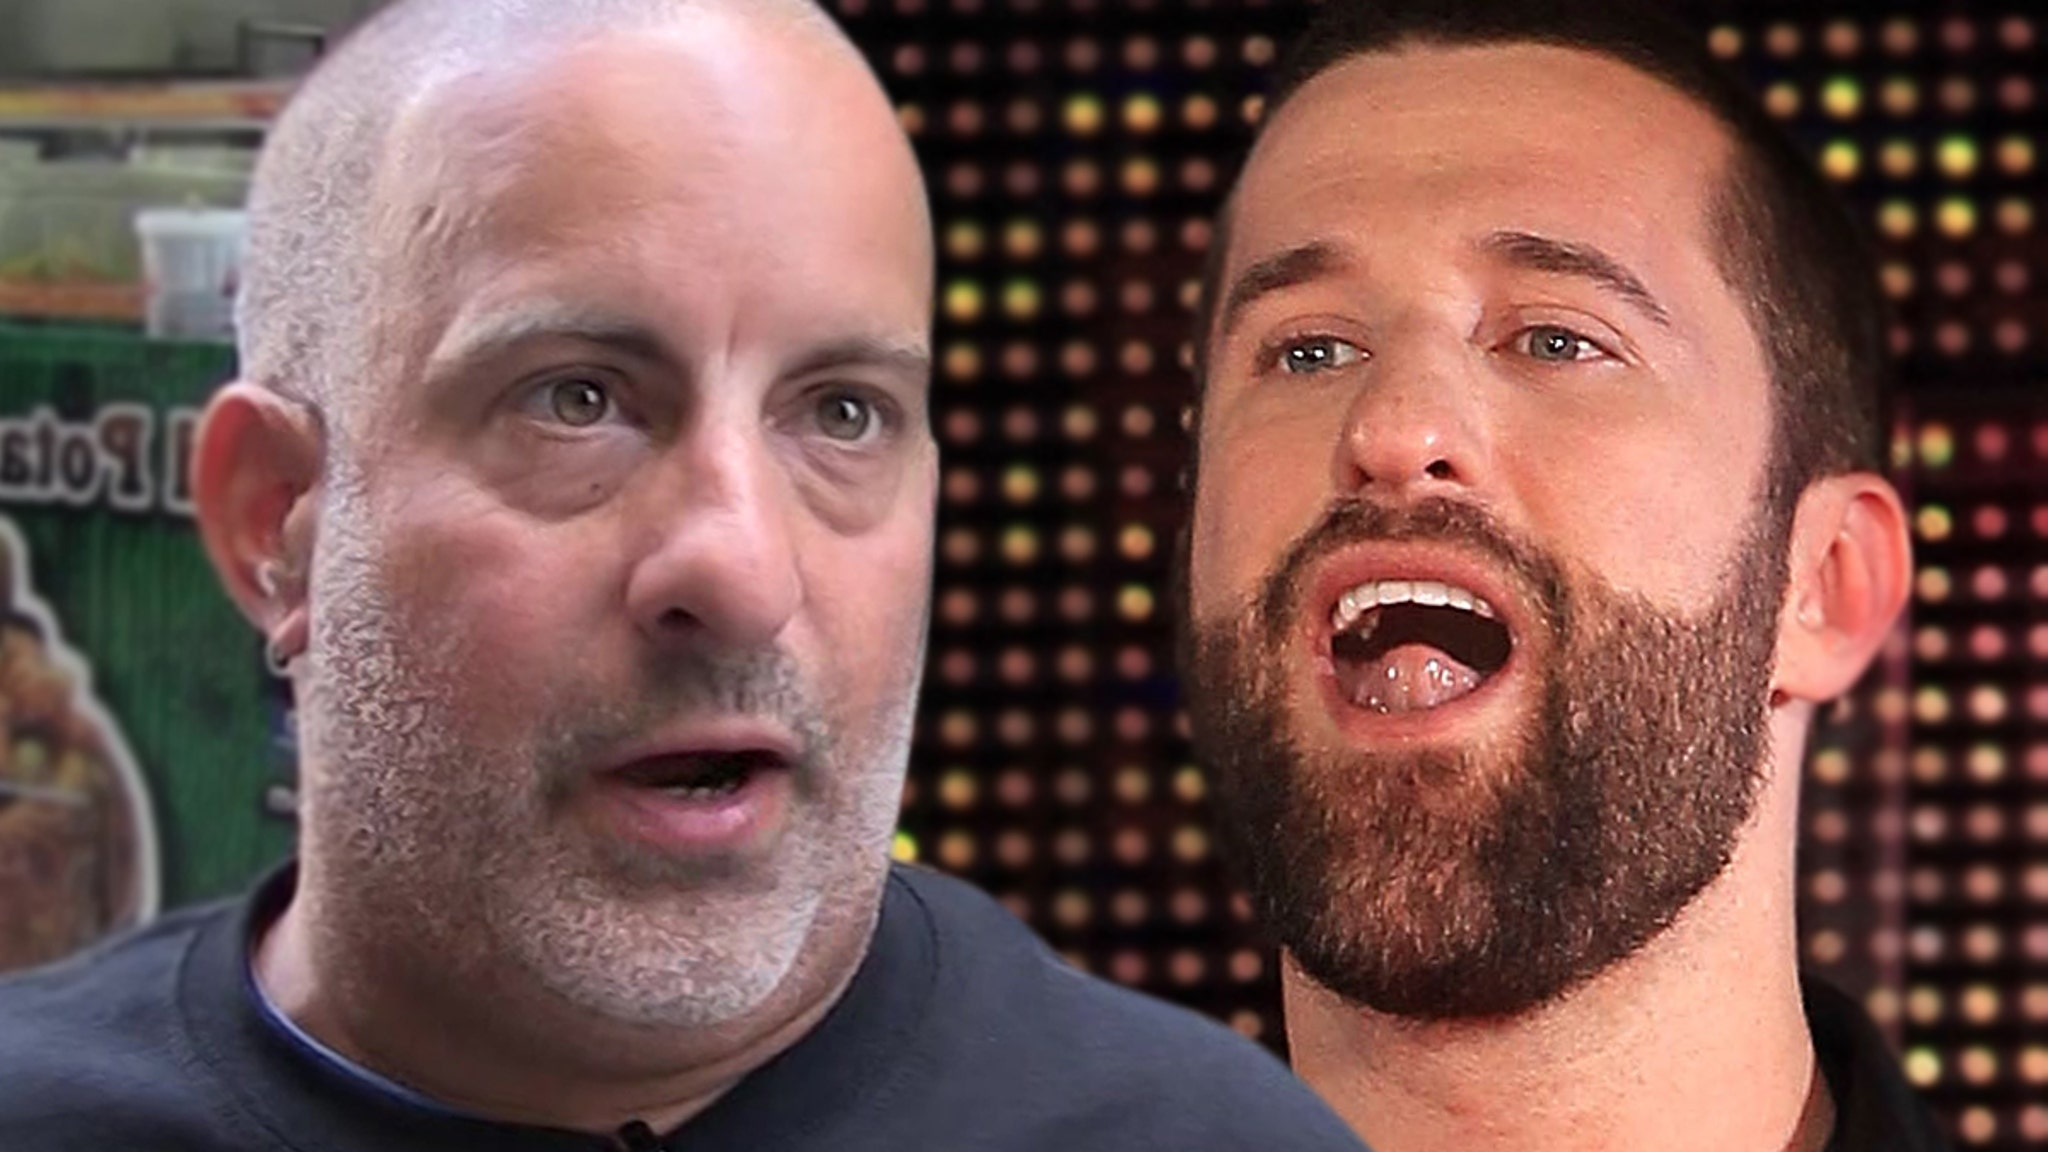 Dustin 'Screech' Diamond Fighting 'Bagel Guy' in Celeb Boxing, Replacing Lenny Dykstra